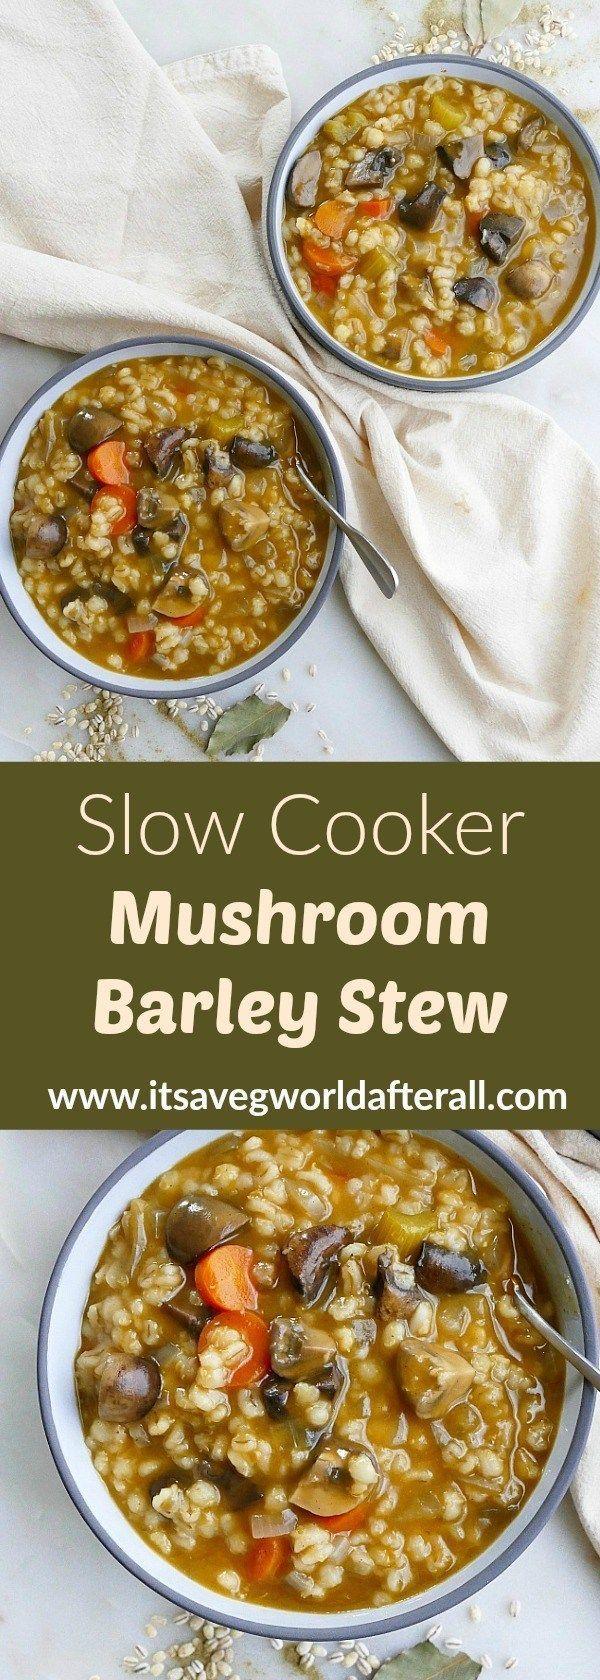 Apr 8, 2020 – Slow Cooker Mushroom Barley Stew – an easy crockpot mushroom barley soup that's vegan, flavorful, and so c…